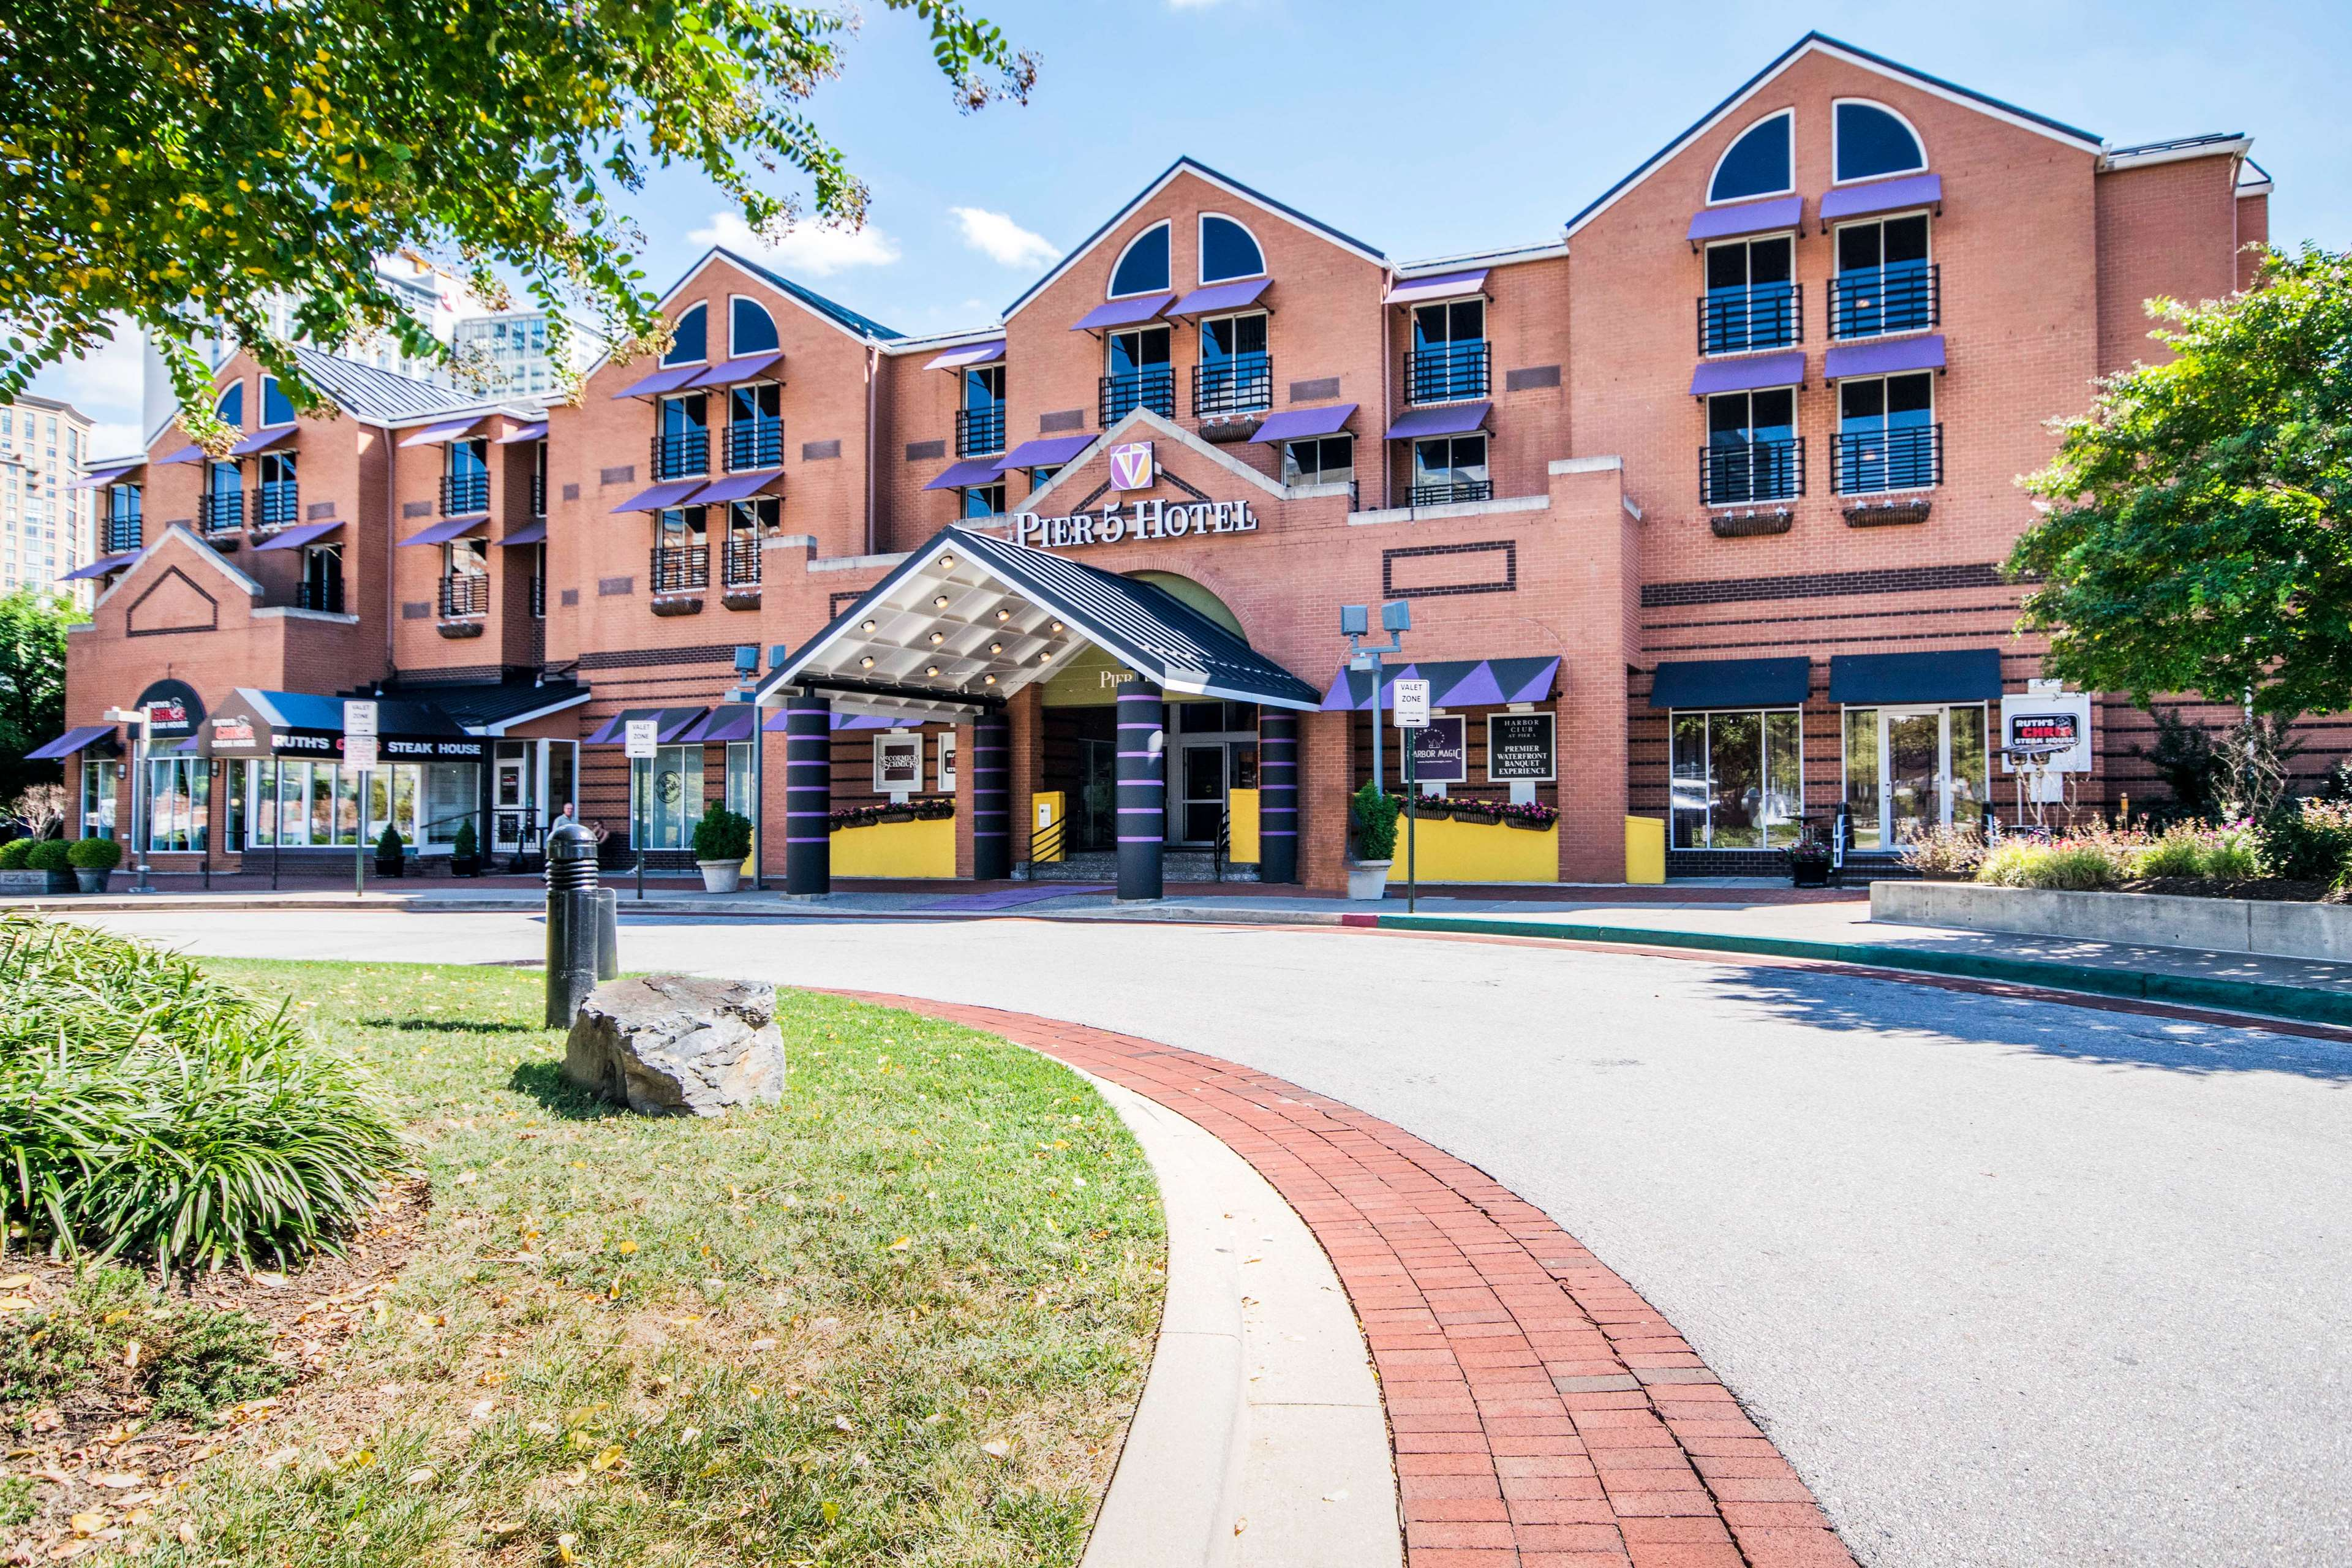 Pier 5 Hotel Baltimore, Curio Collection by Hilton image 2